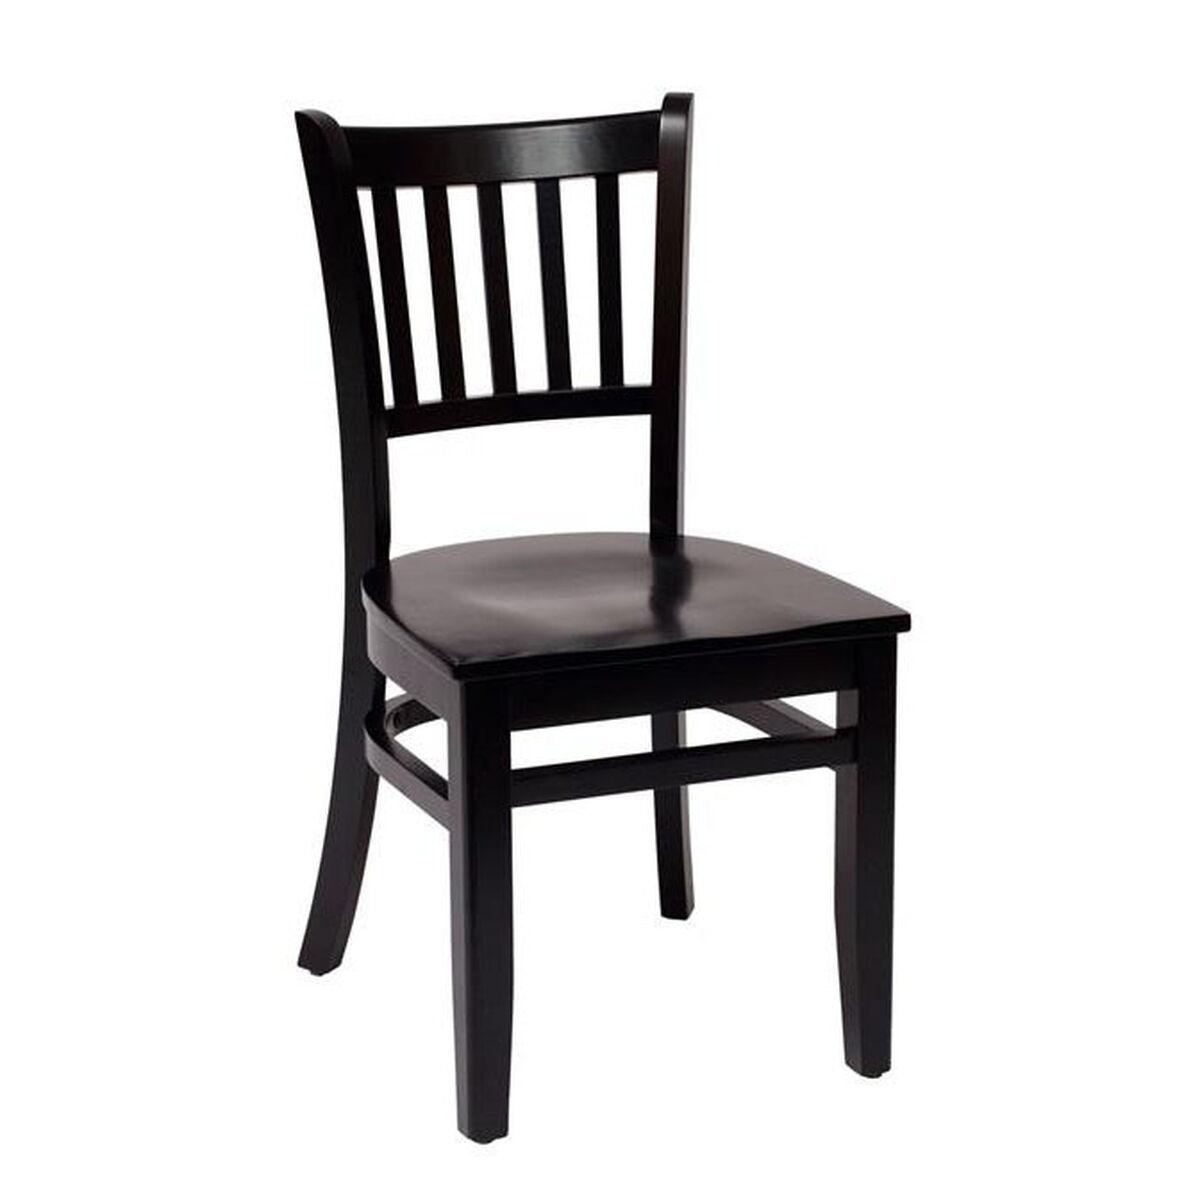 Delran Wood Slat Back Chair Lwc102blblw Bizchair Com